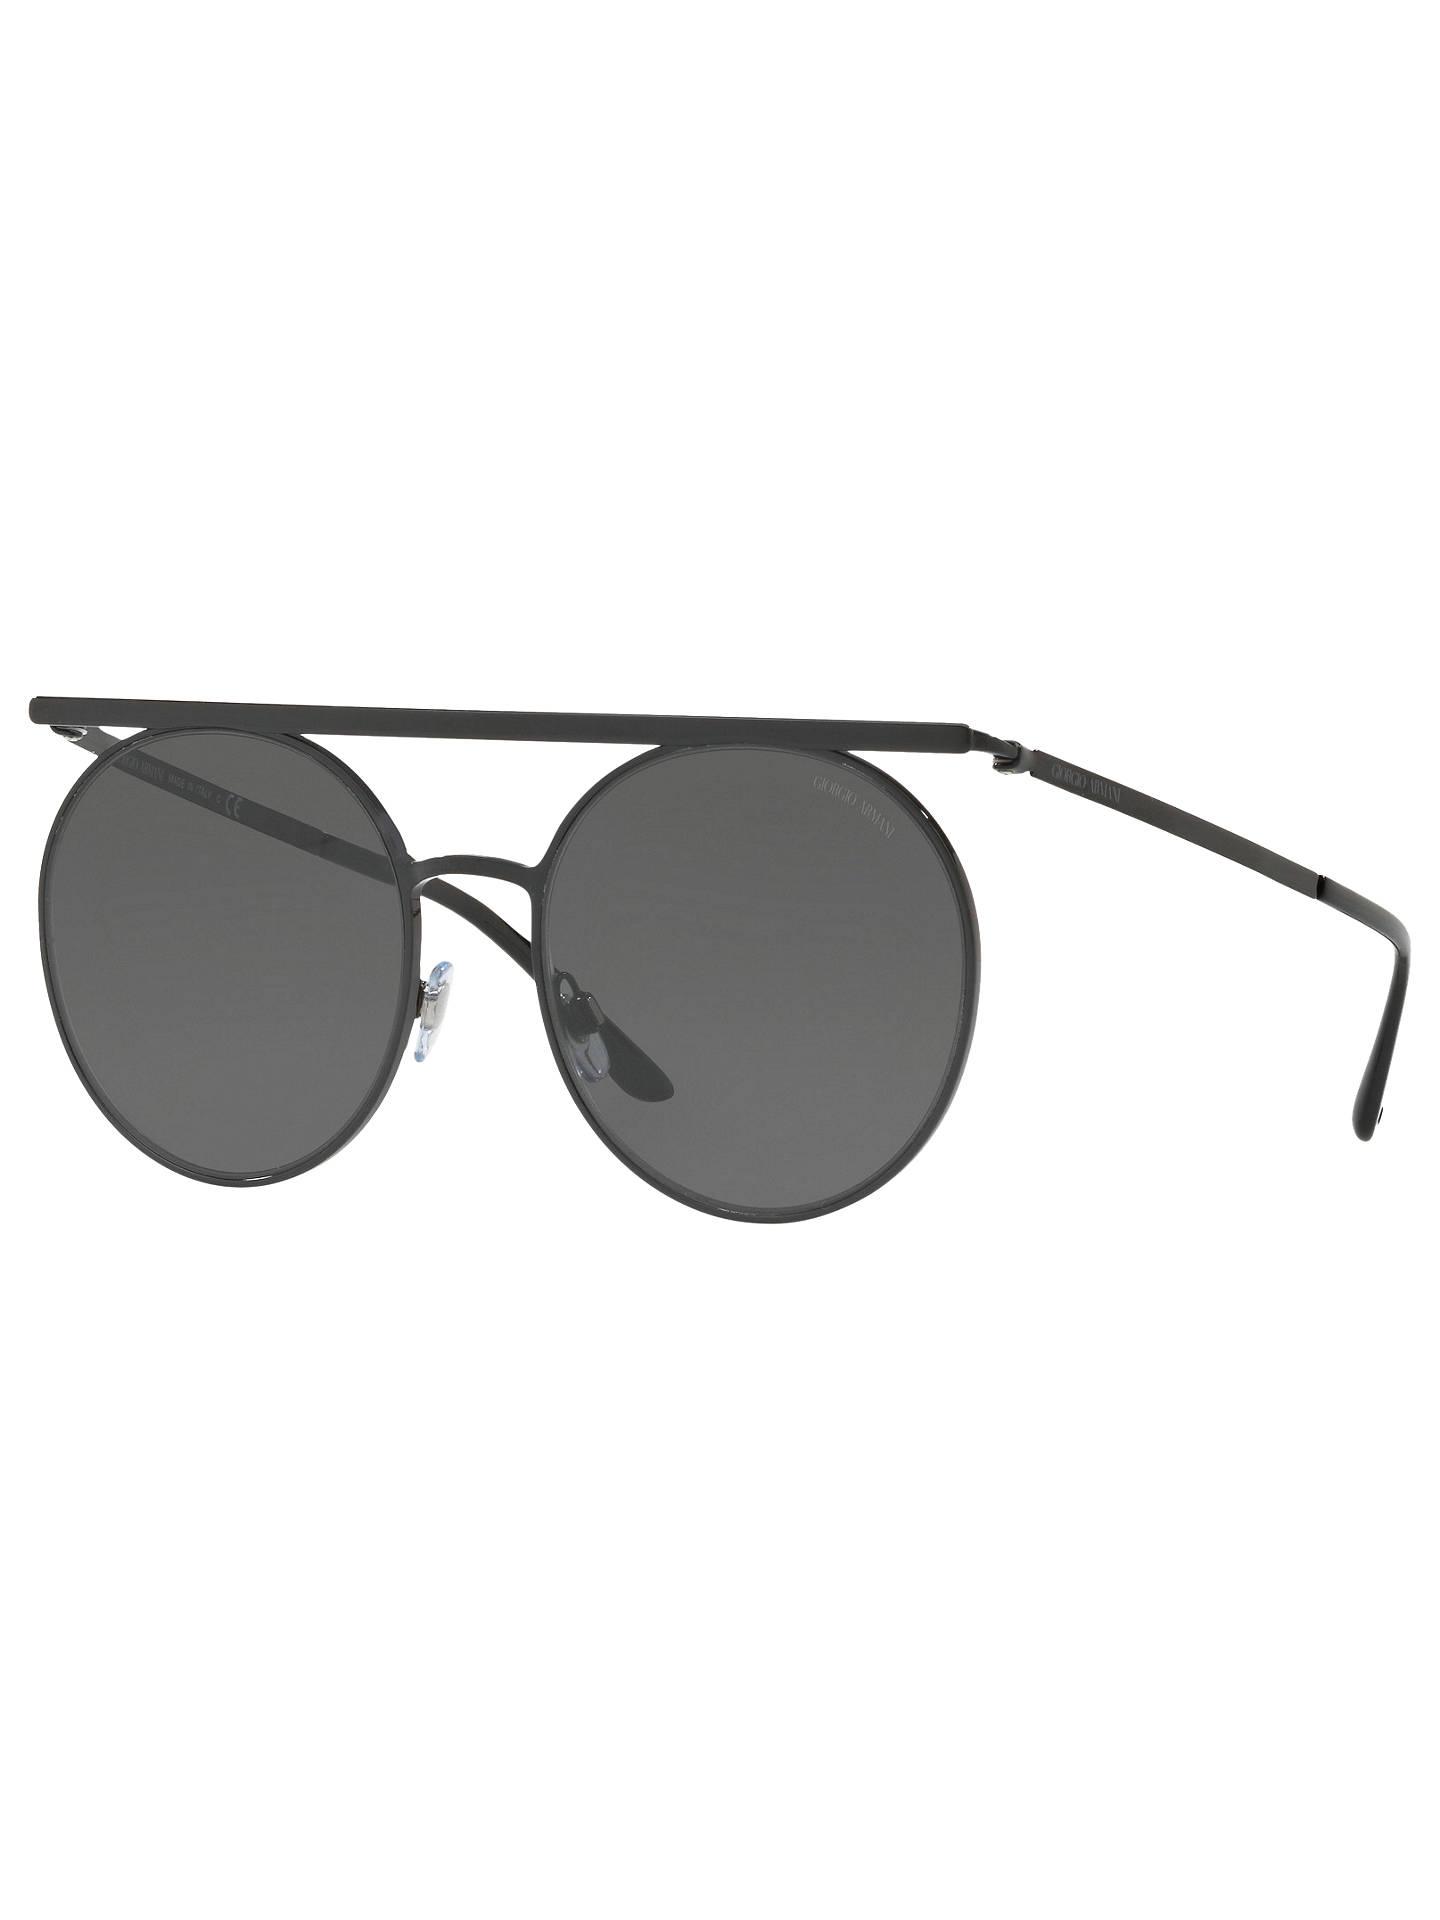 46cf2556b9 Buy Giorgio Armani AR6069 Round Sunglasses